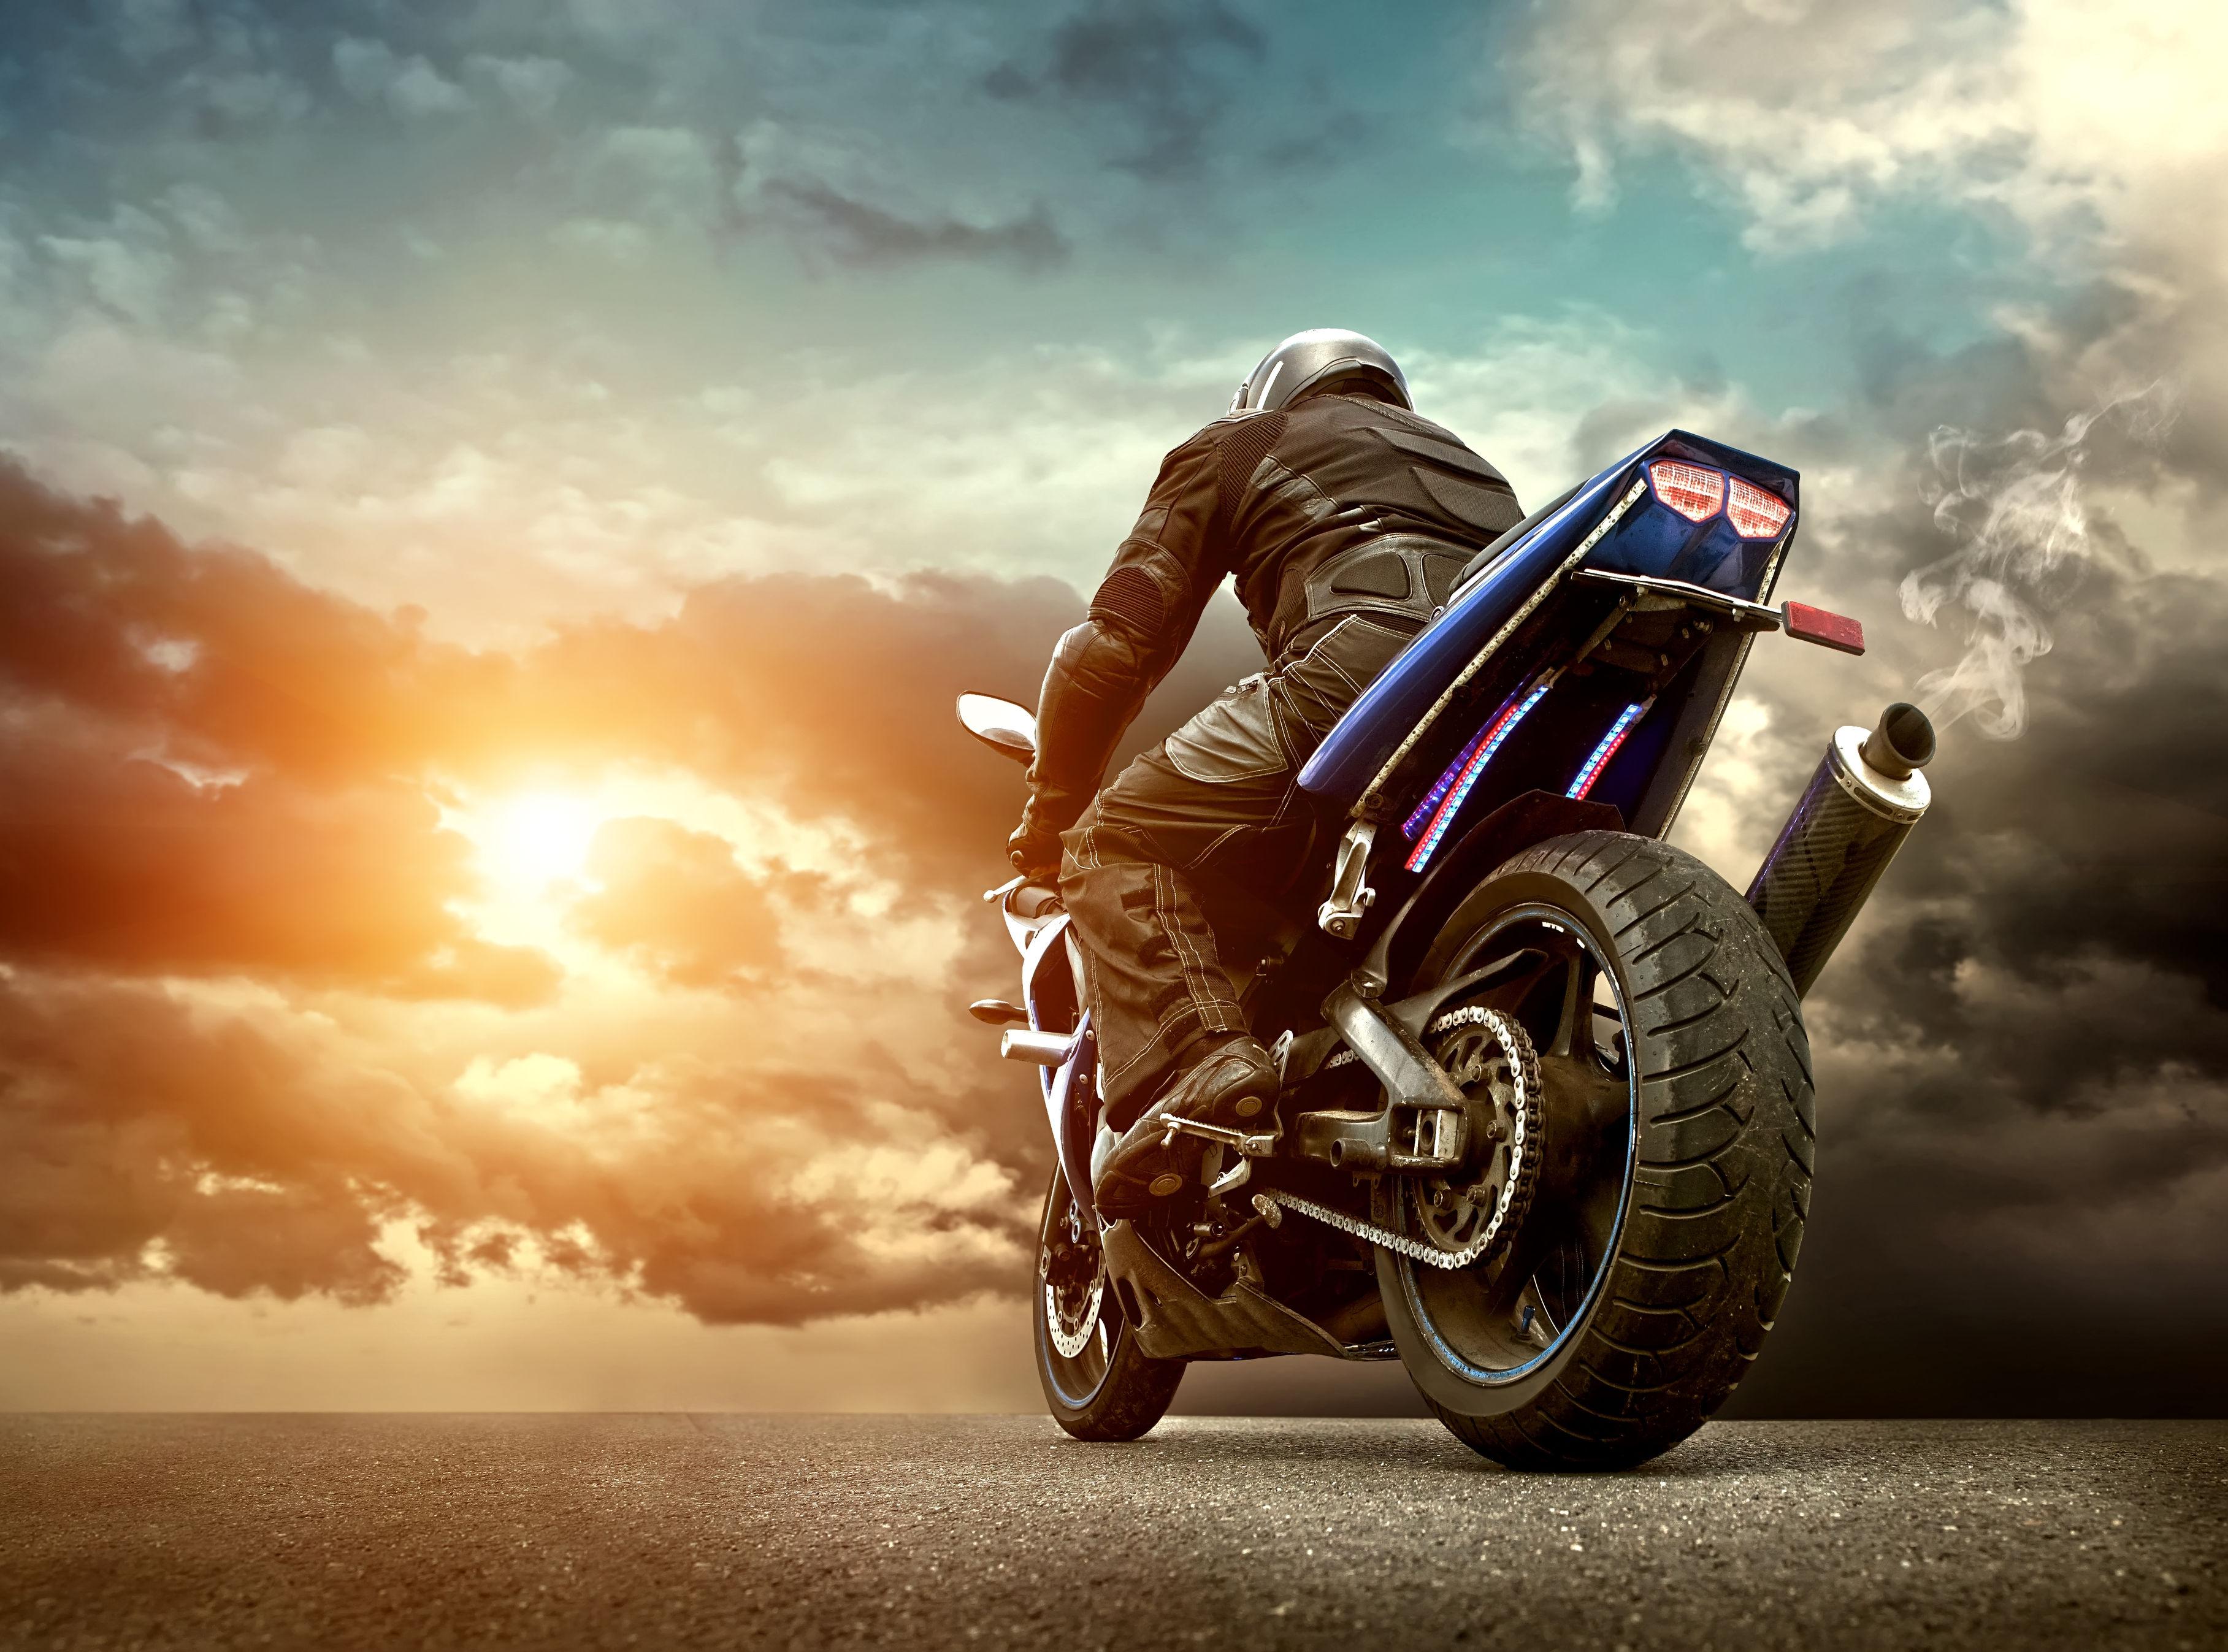 Consórcio realiza o sonho de ter moto de grande cilindrada